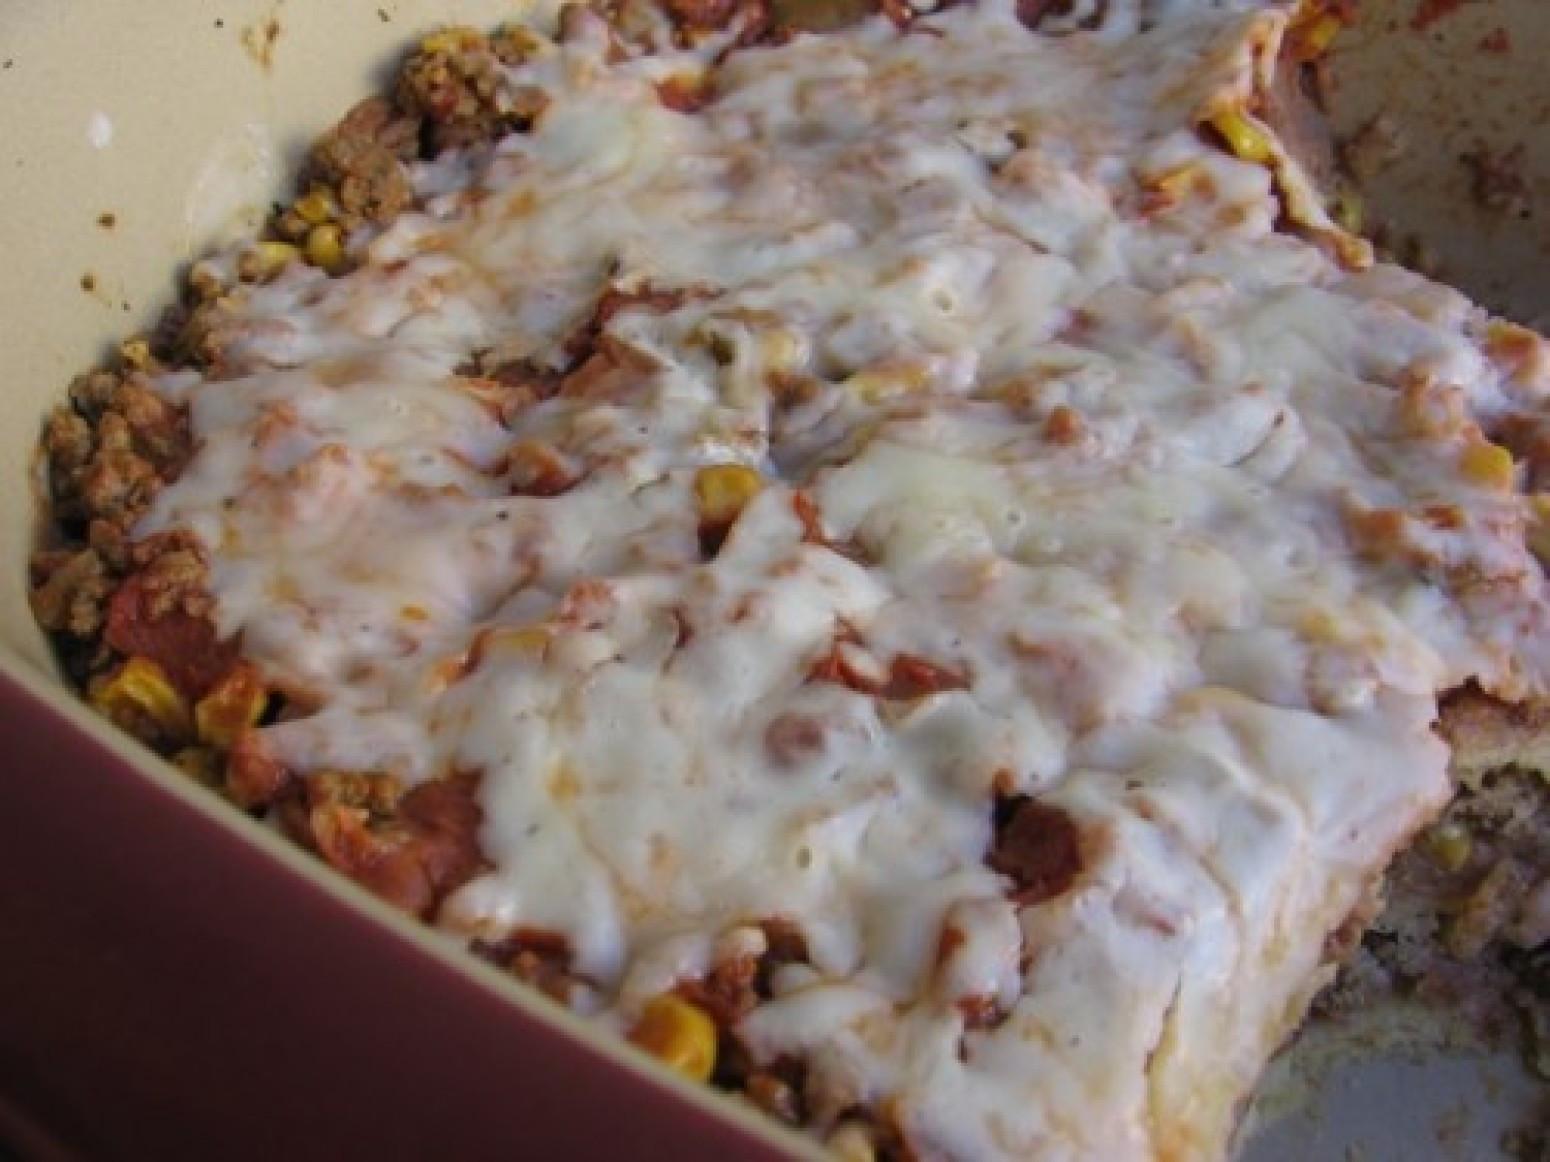 Healthy Casseroles With Ground Beef  Slim & Healthy Ground Beef Enchilada Casserole Recipe